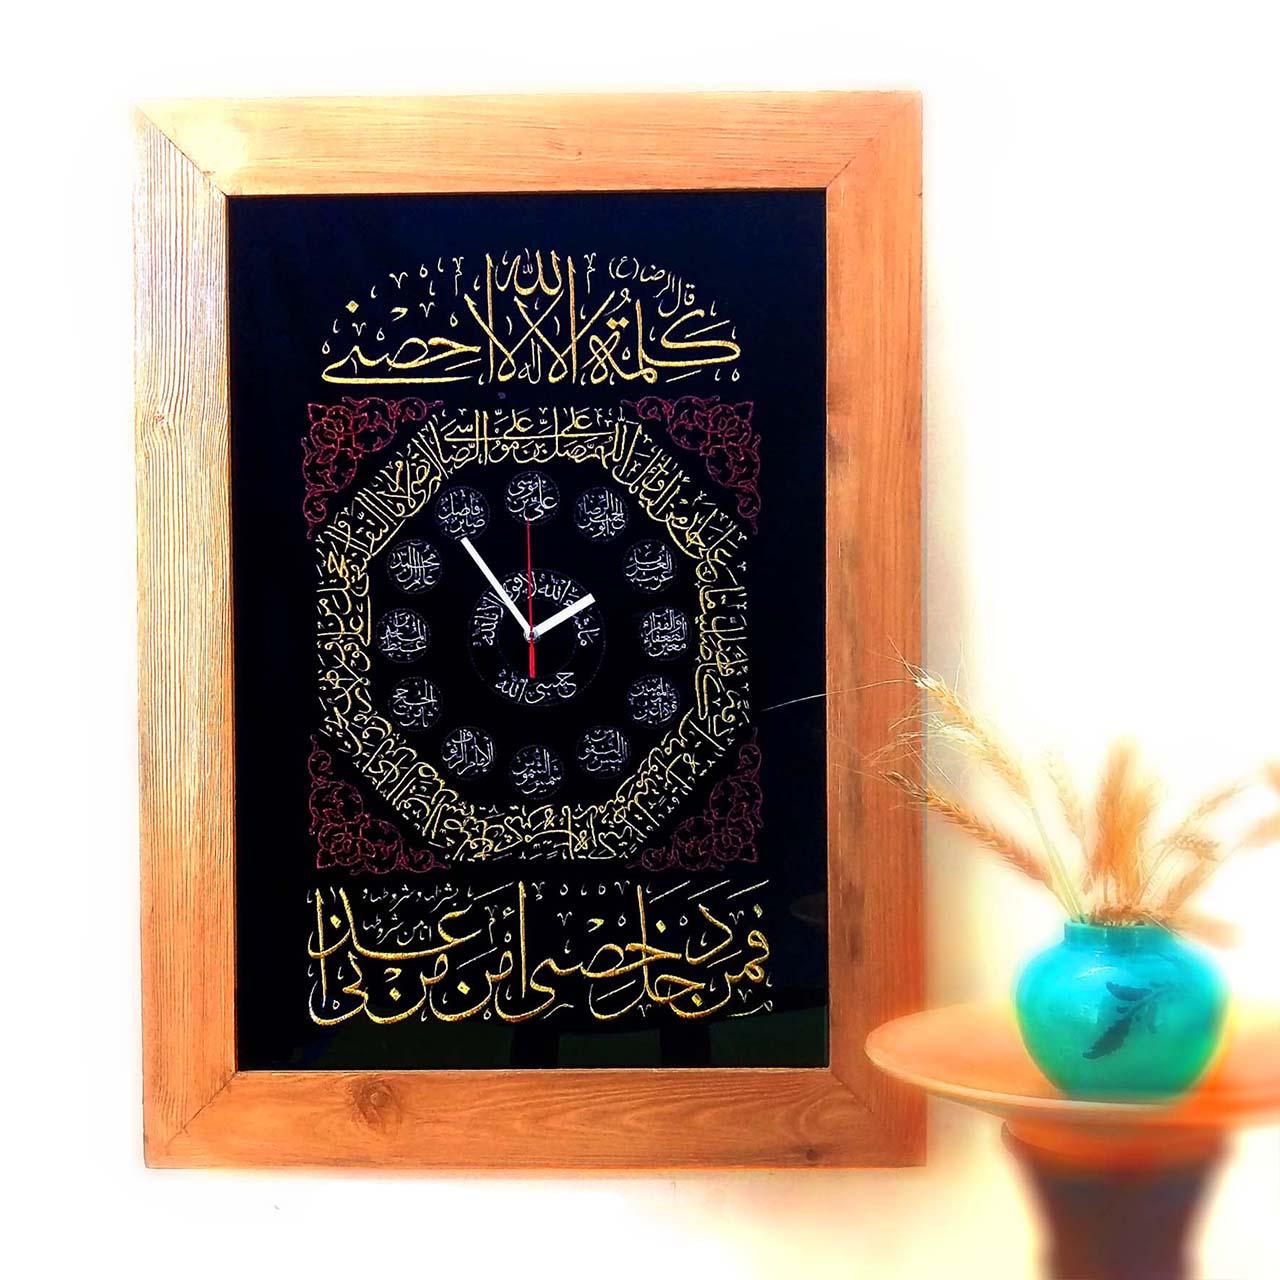 تابلو پرچم دوزی ساعت لوح هنر طرح صلوات خاصه امام رضا علیه السلام کد 162